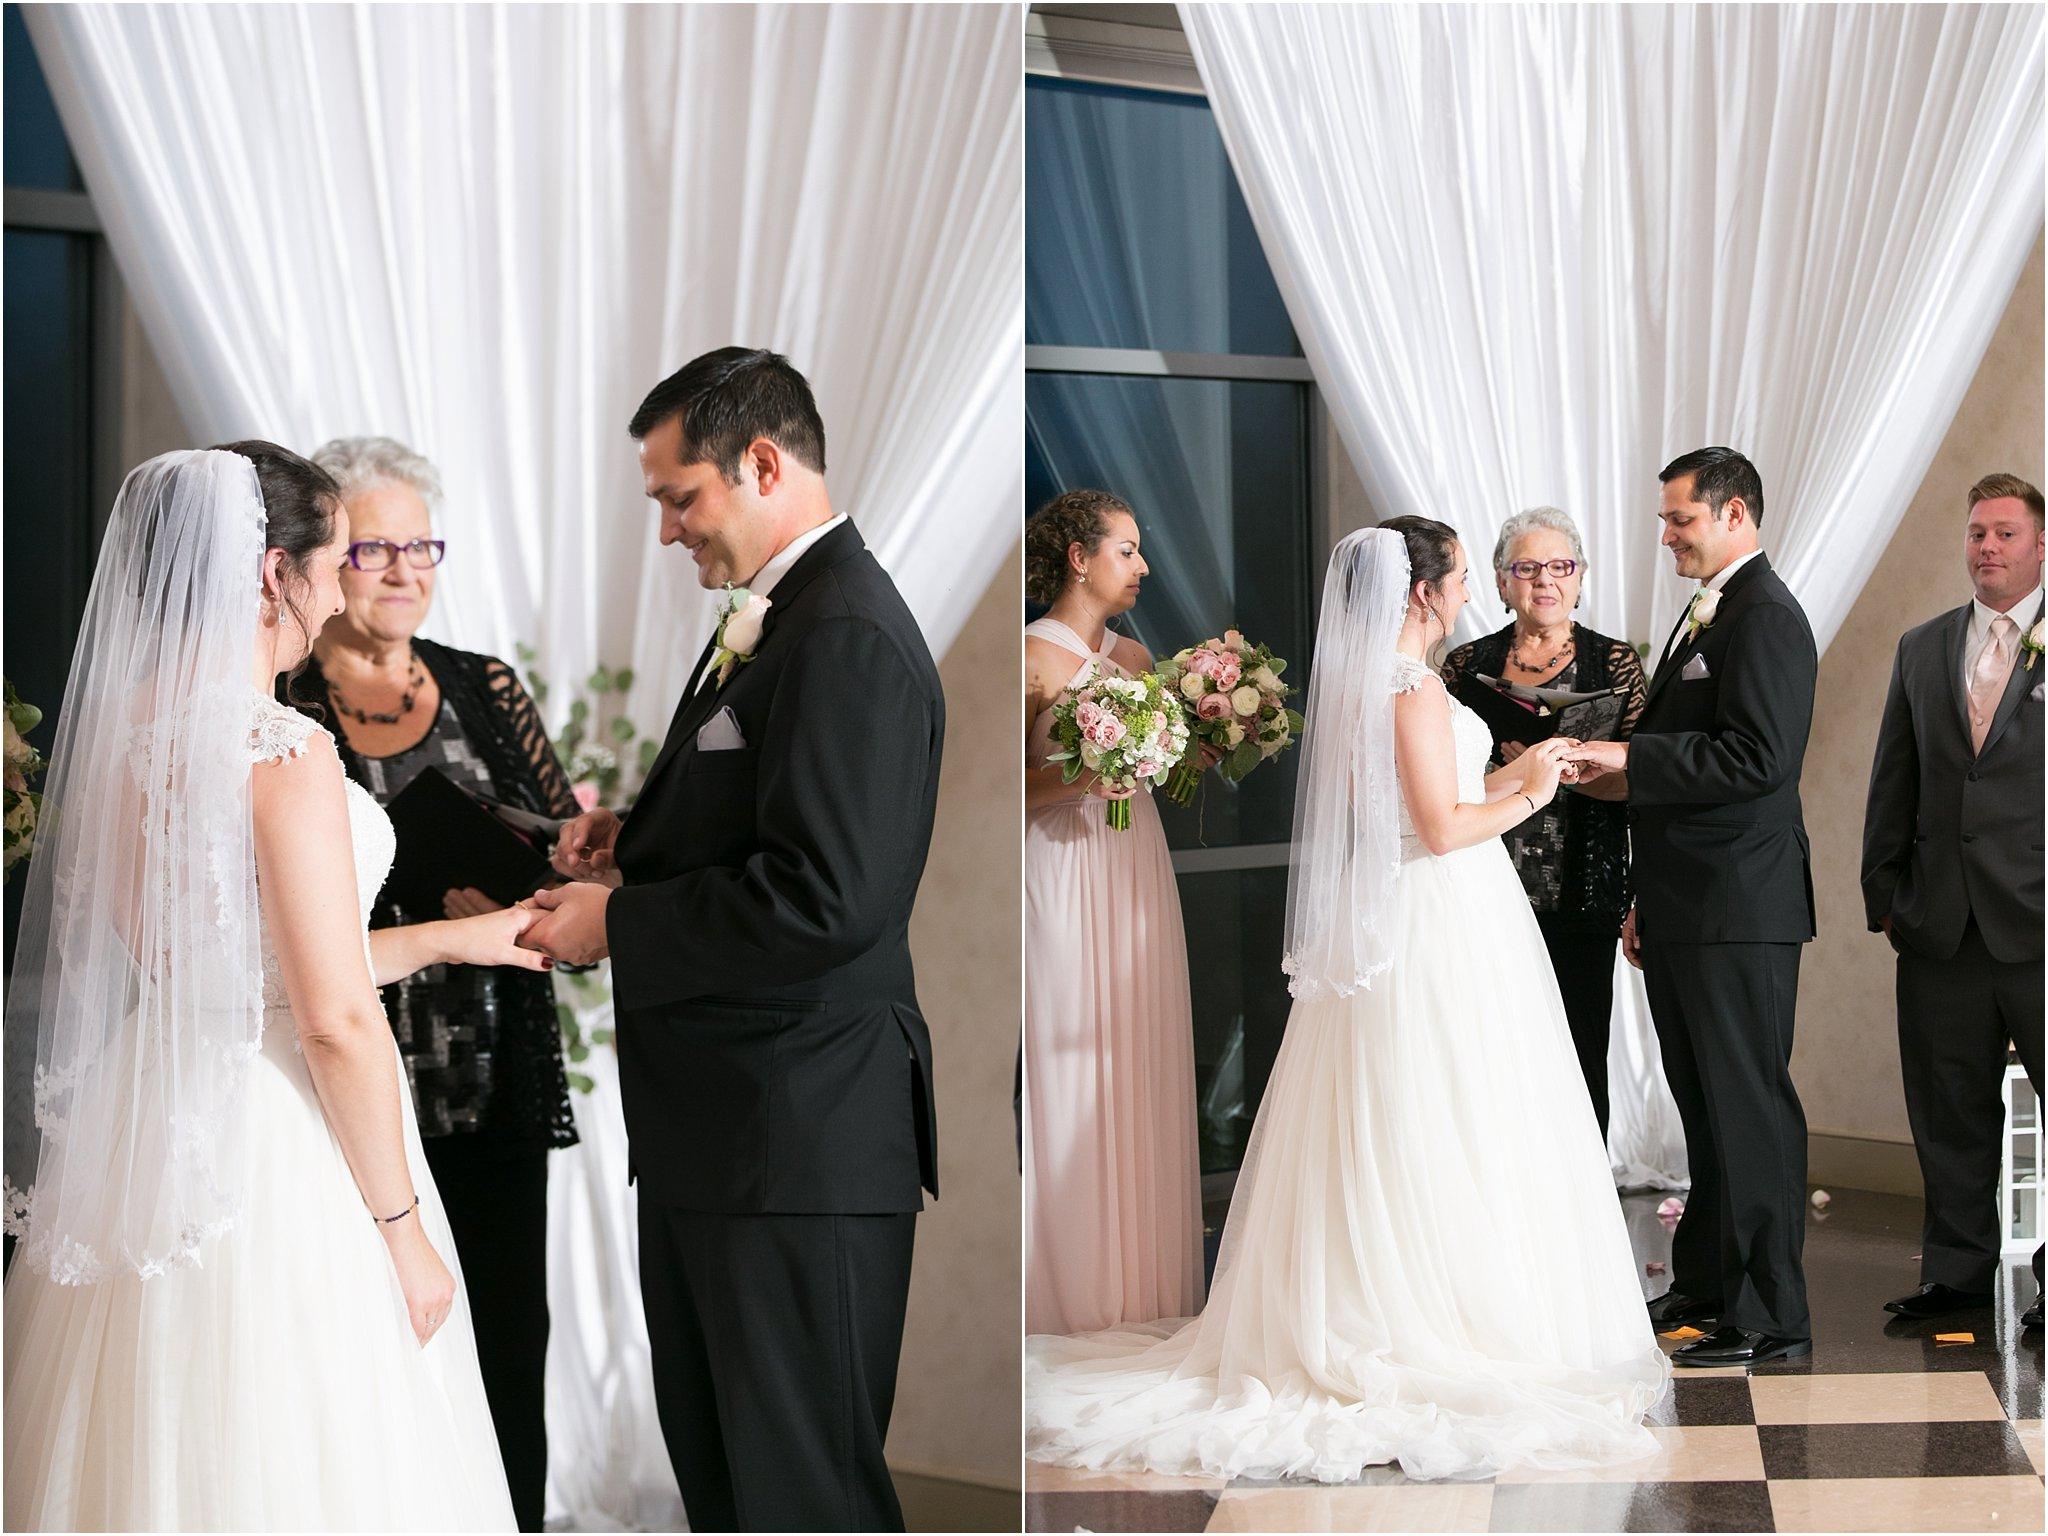 jessica_ryan_photography_virginia_wedding_photographer_wedding_hurricane_norfolk_botanical_gardens_hurricane_matthew_wedding_3593